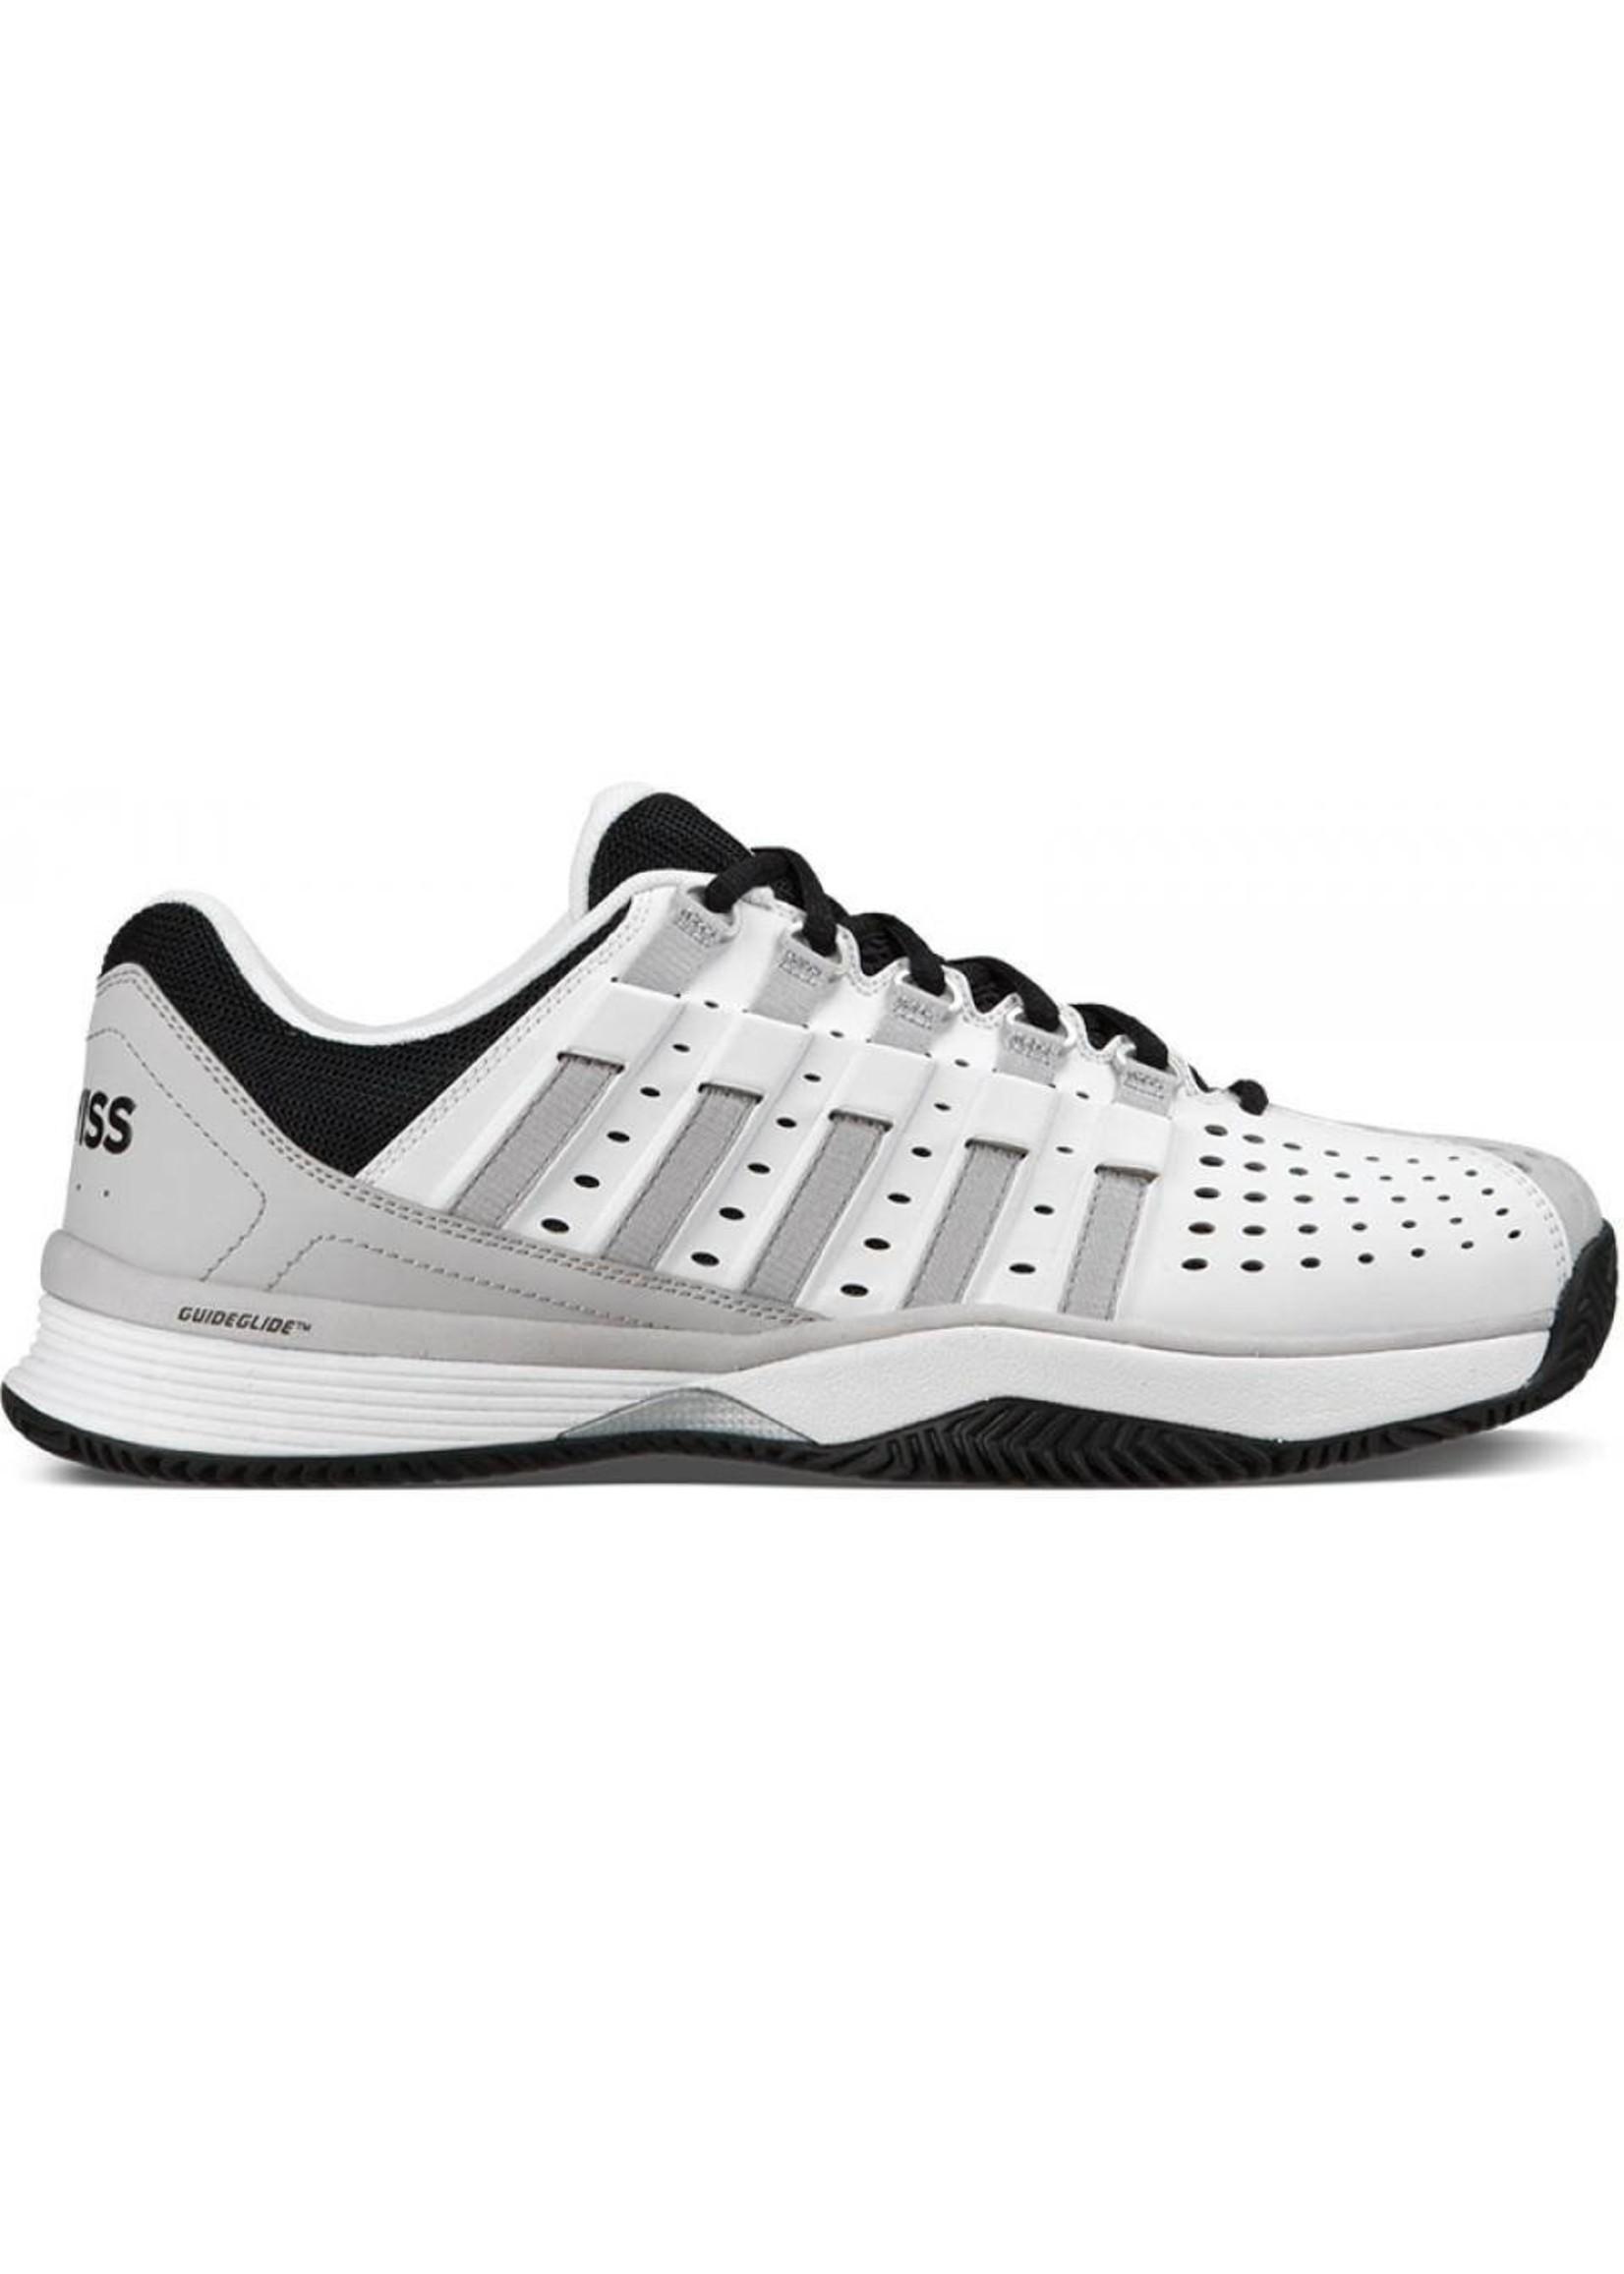 K Swiss KSwiss Mens Hypermatch Tennis Shoe (2017) - White/ Gull Grey